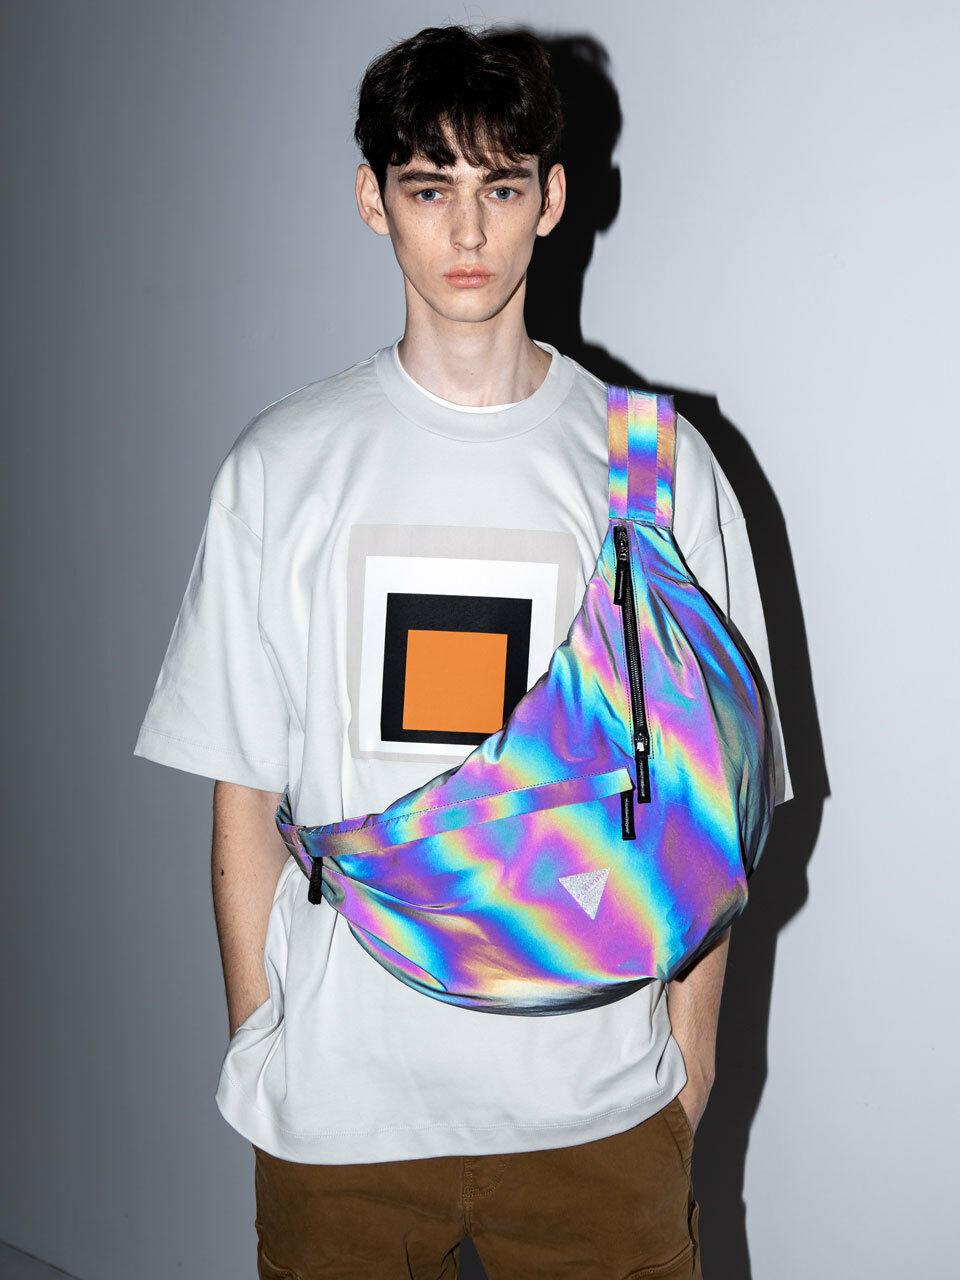 Snug Body Bag _ 3M (reflective)